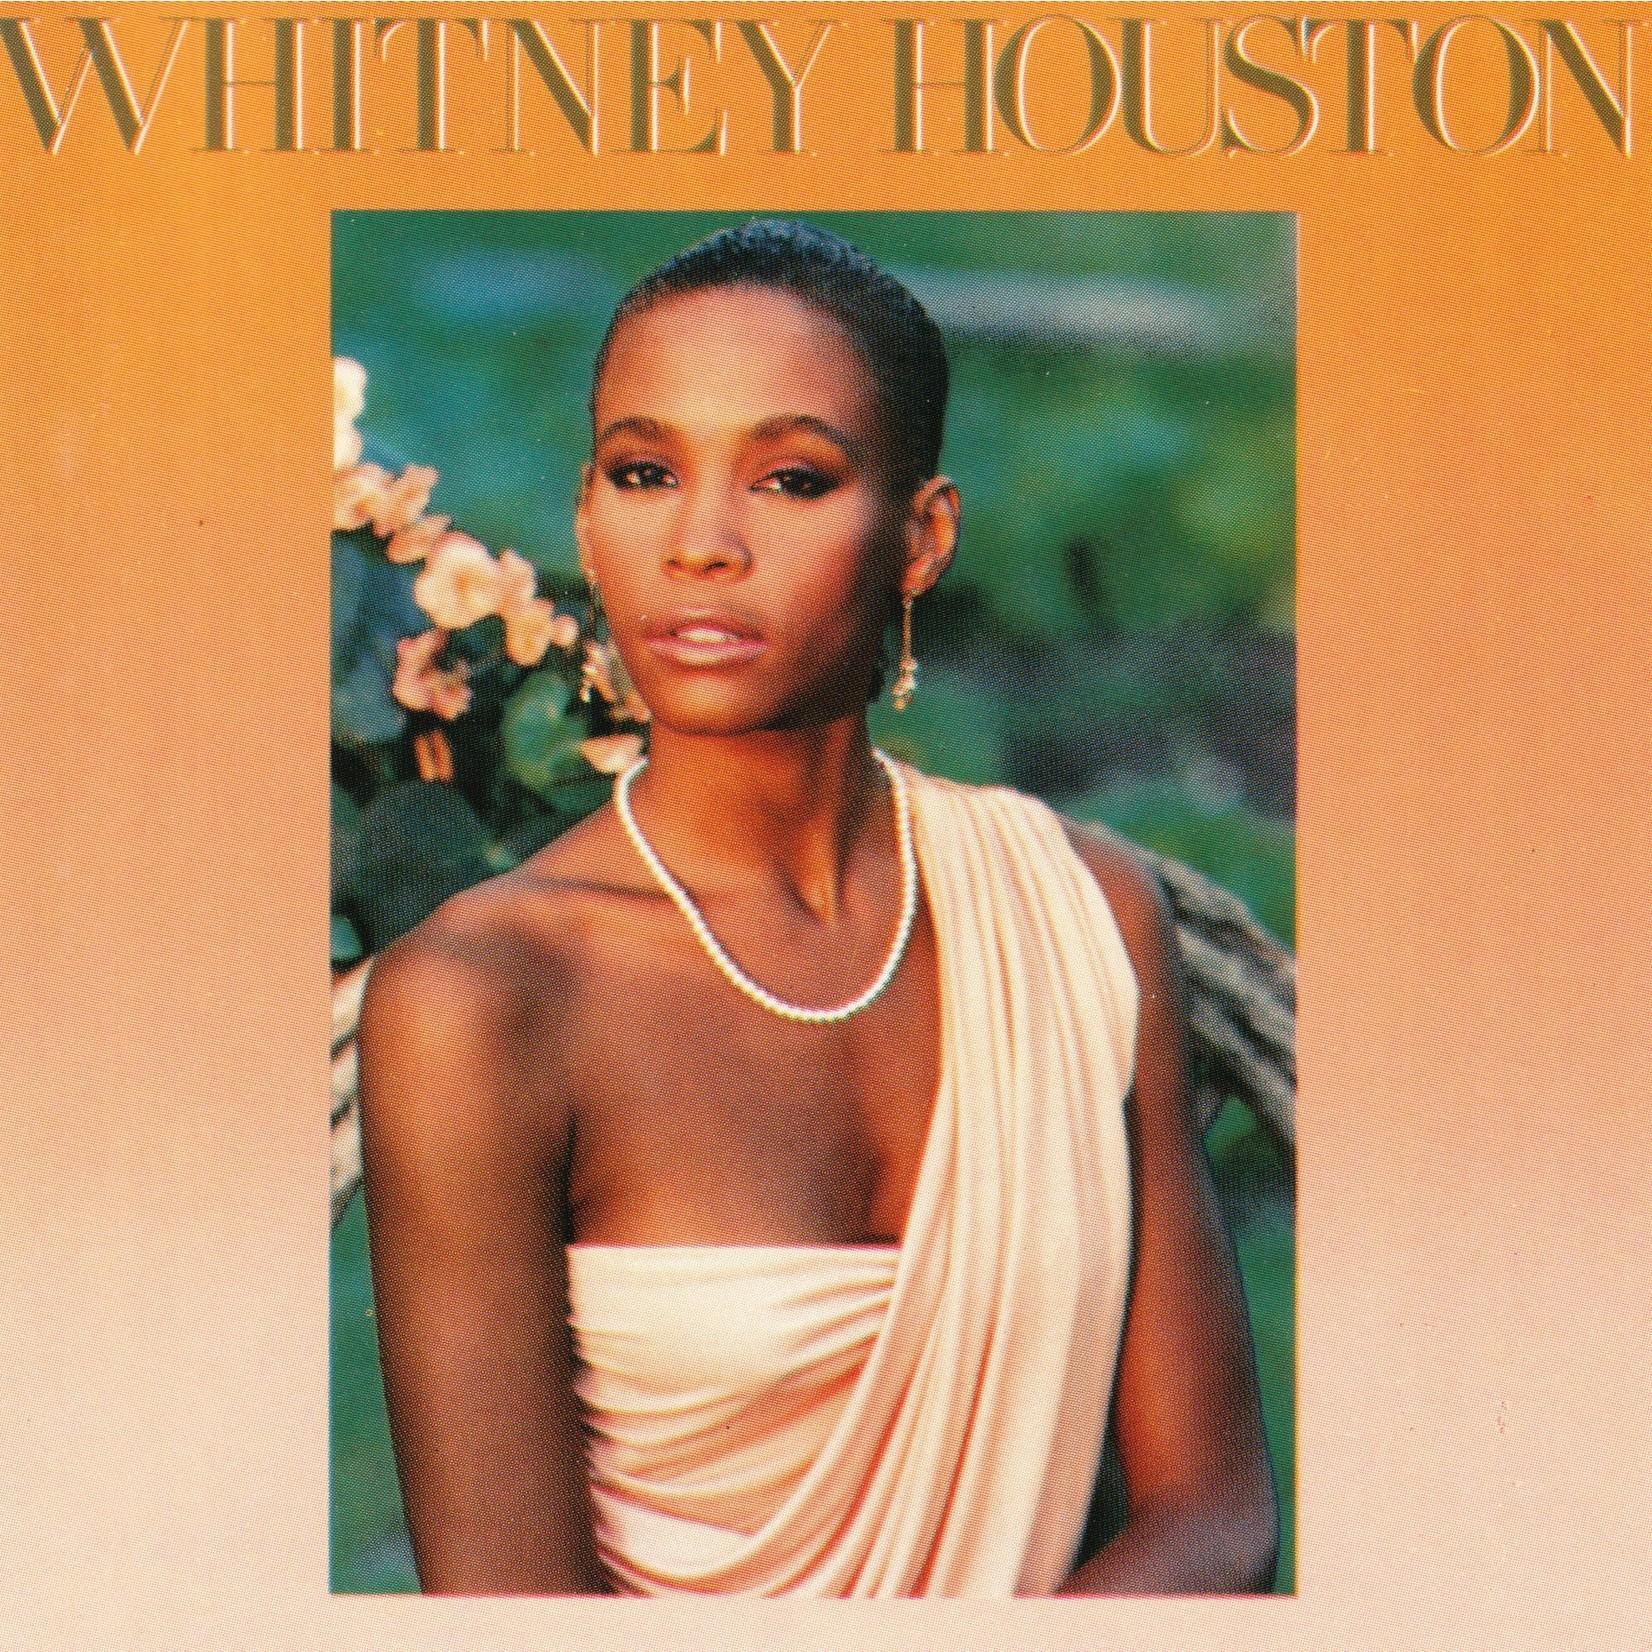 [Vintage] Houston, Whitney: self-titled